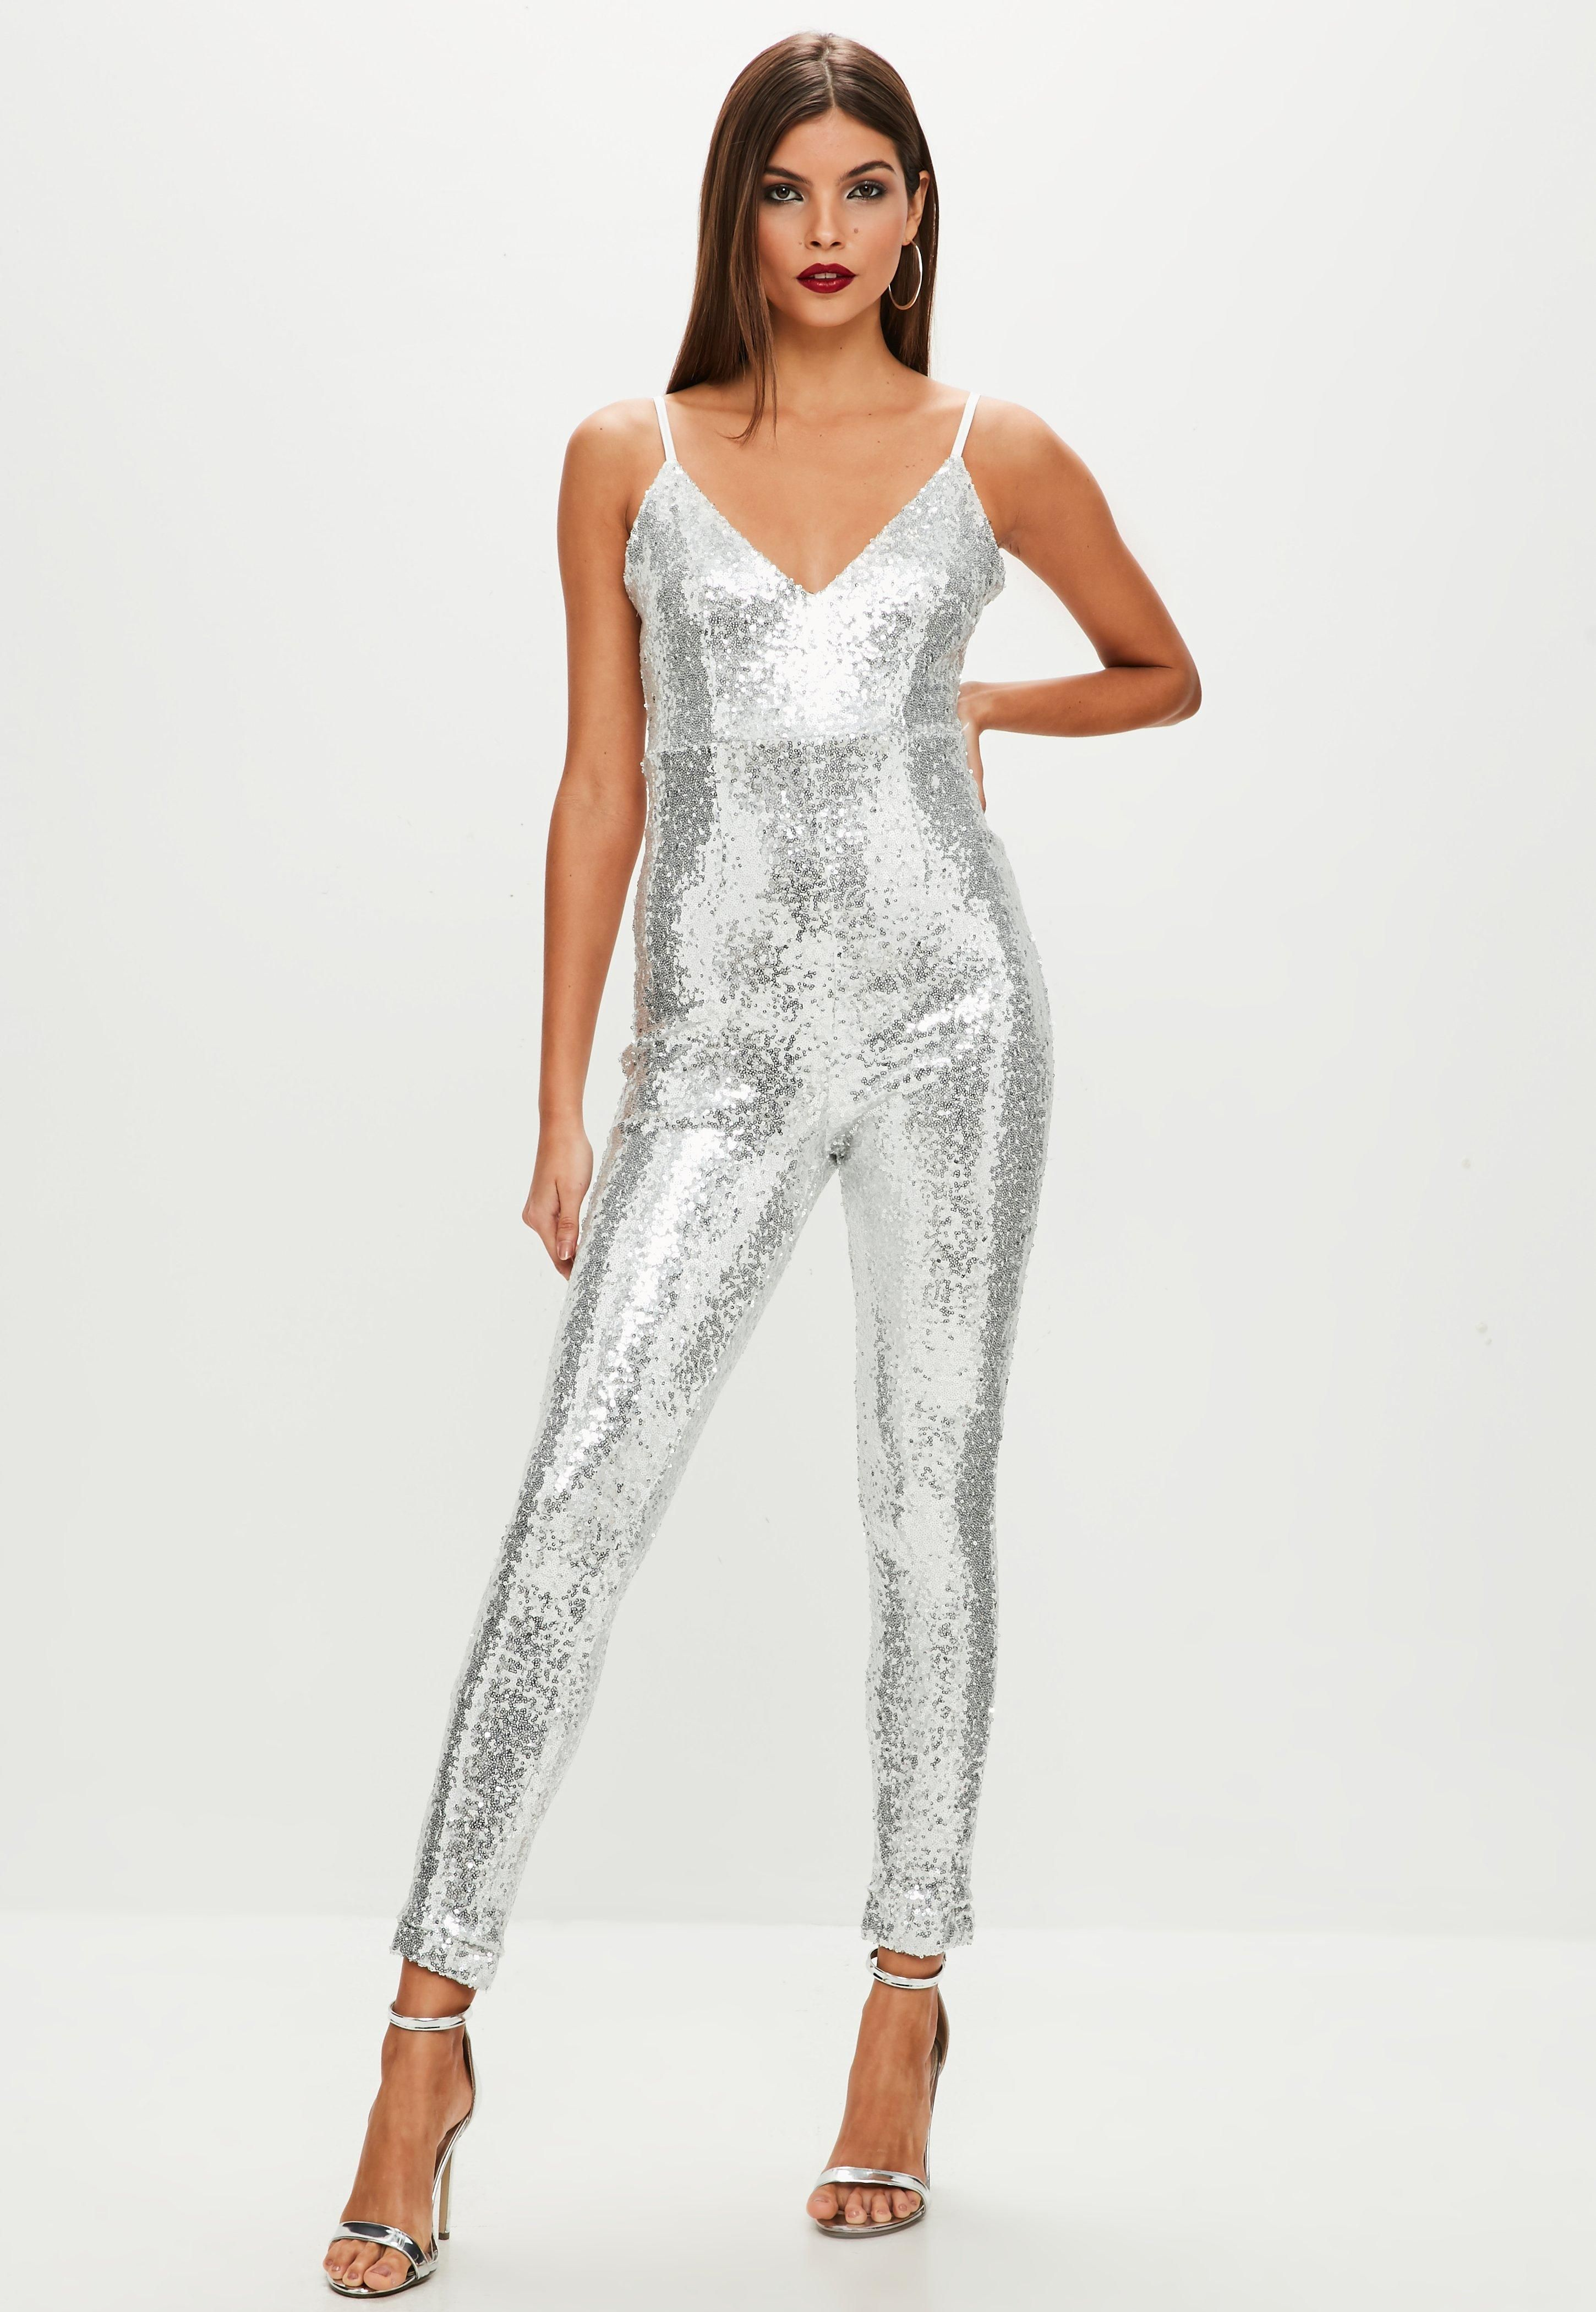 c9b34eb1e4 Missguided Silver Sequin Unitard Jumpsuit ---- Taina Duarte ----